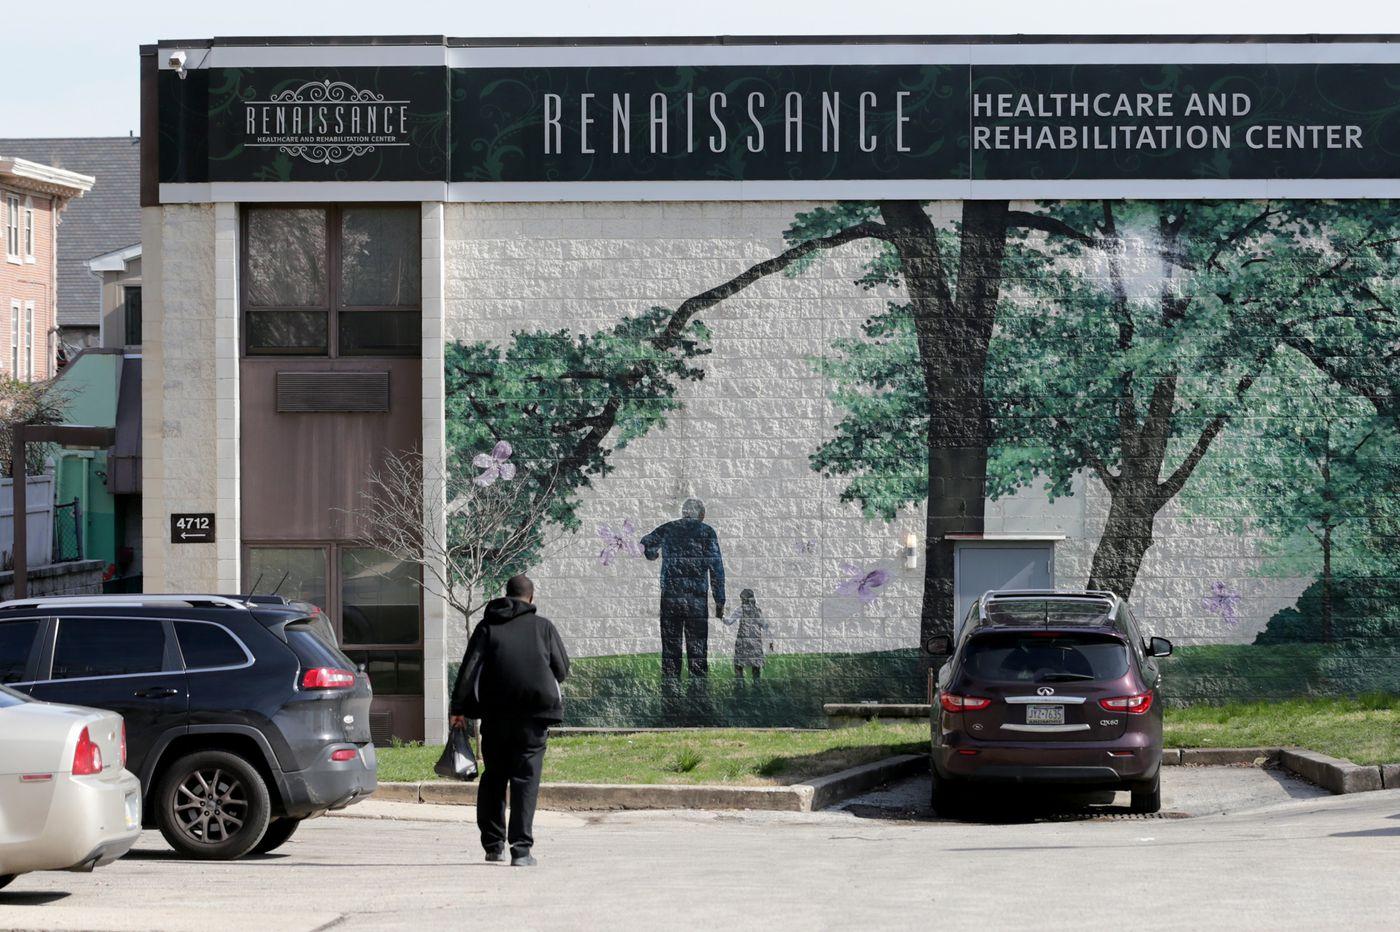 Philadelphia nursing homes need help, not blame | Expert Opinion